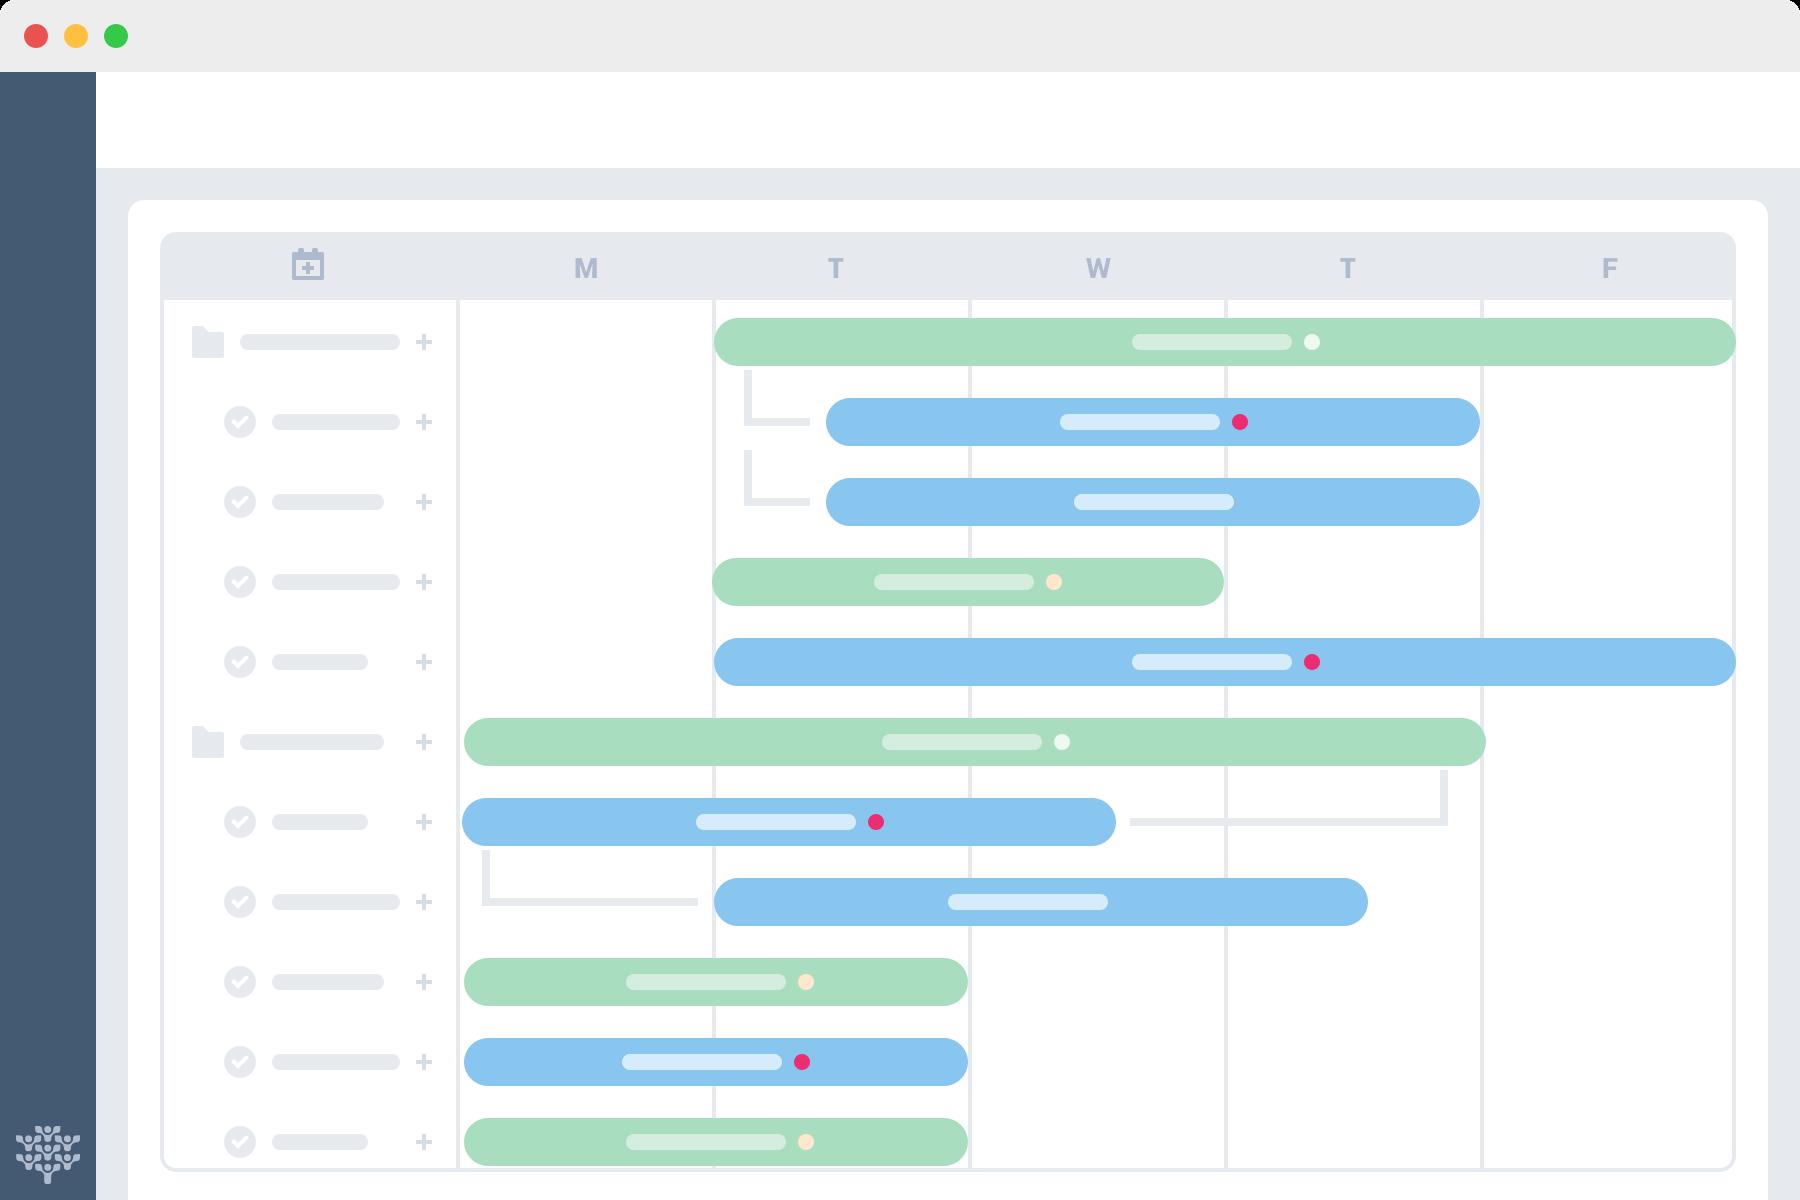 Intelligent Project Management - Gantt Chart